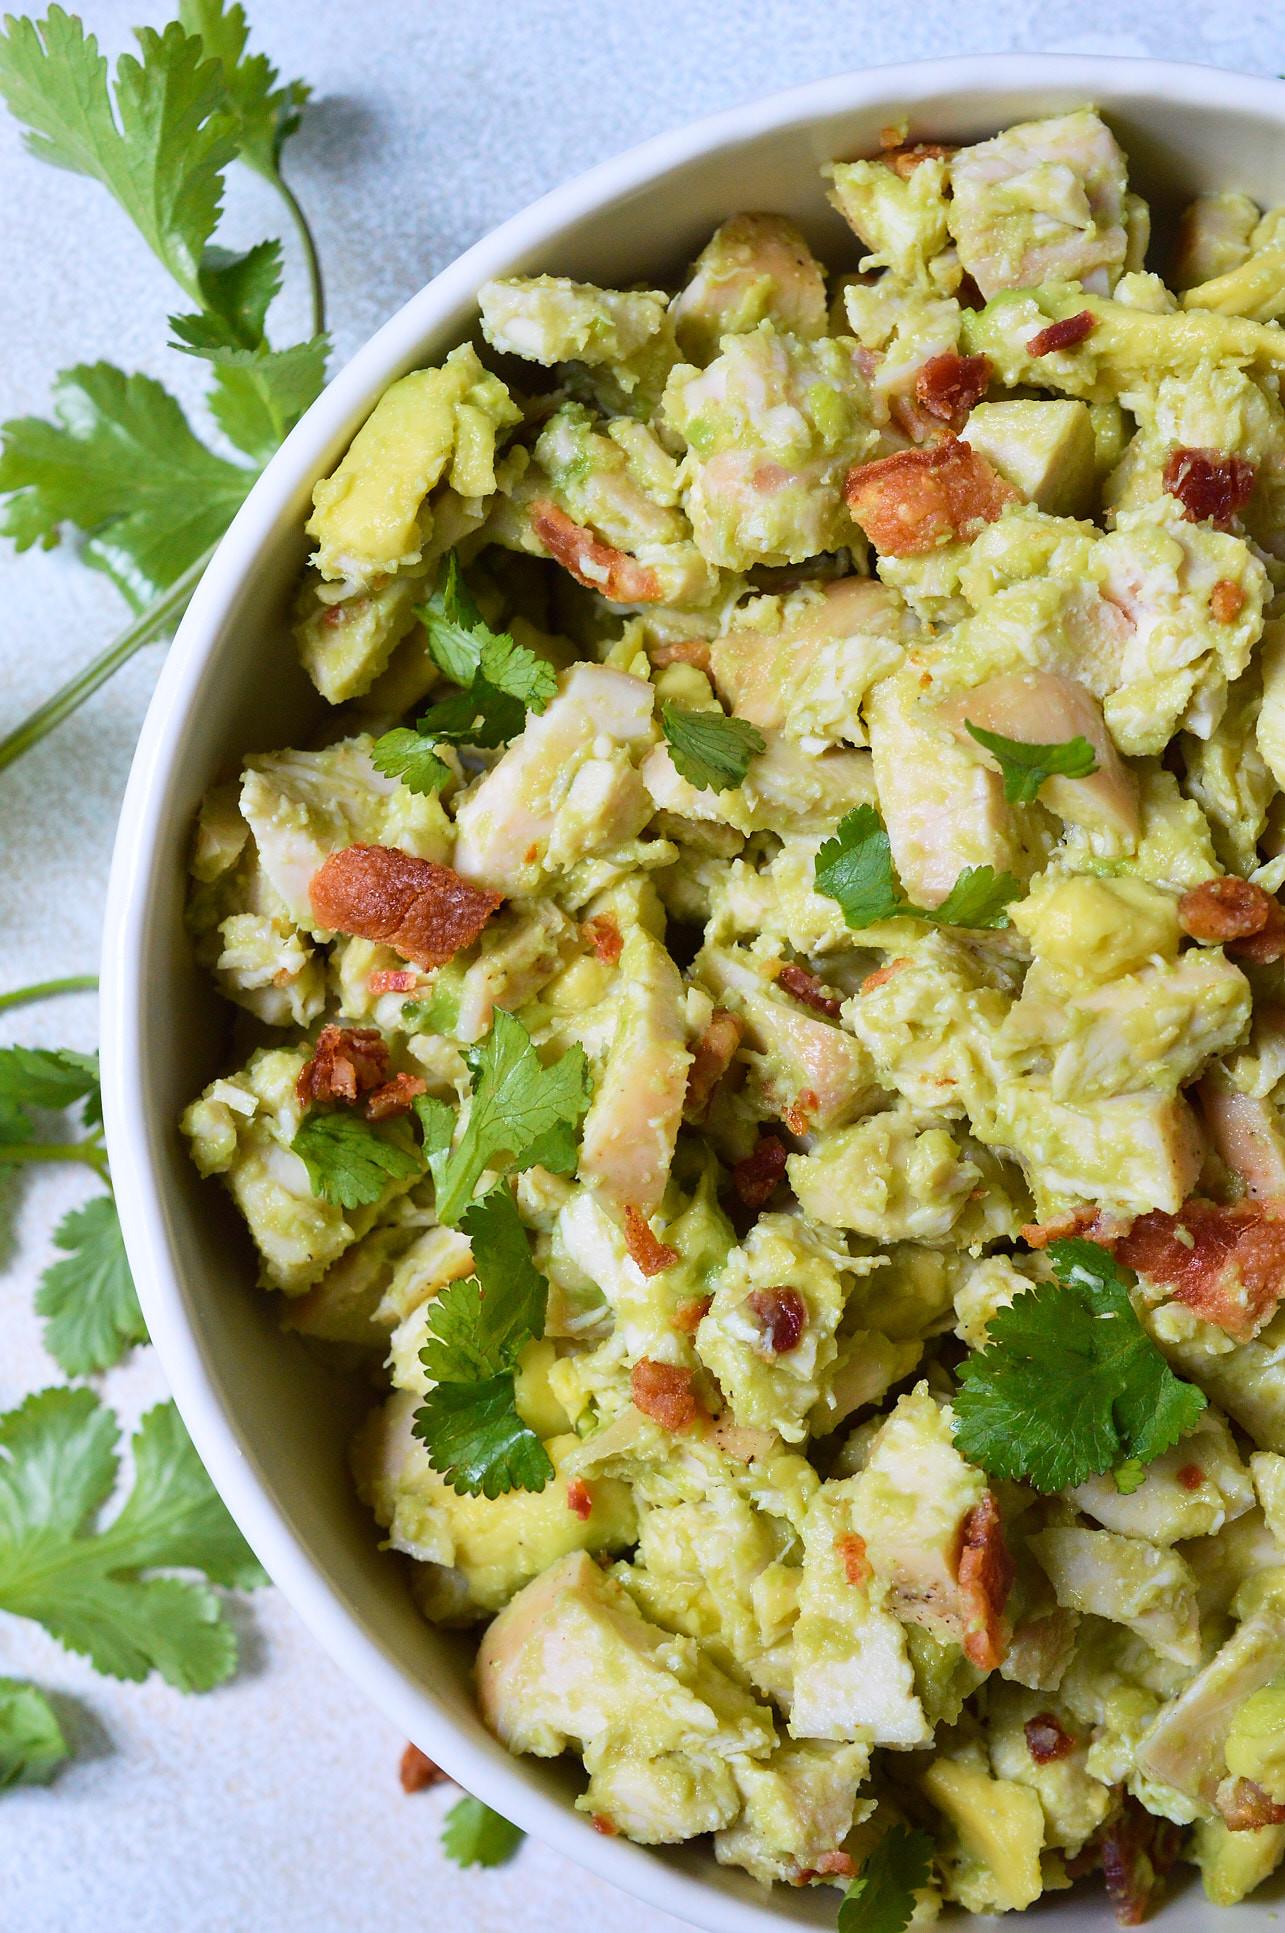 Avocado Recipes Healthy  Bacon Avocado Chicken Salad Whole30 Recipe WonkyWonderful